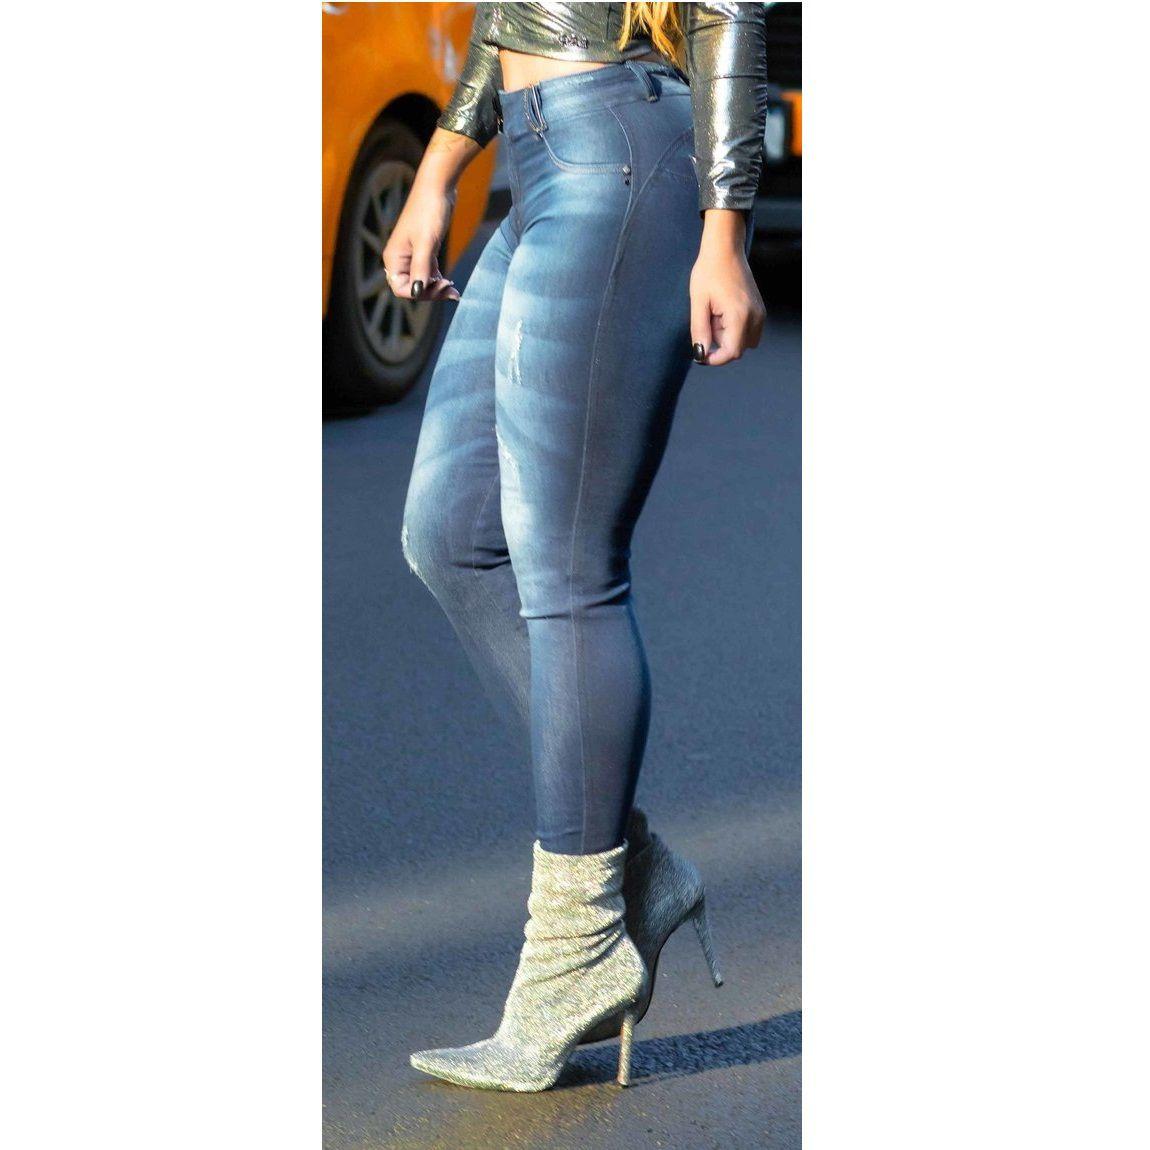 Calça PitBull Jeans Feminina  Cigarrete Pit Bull 27327